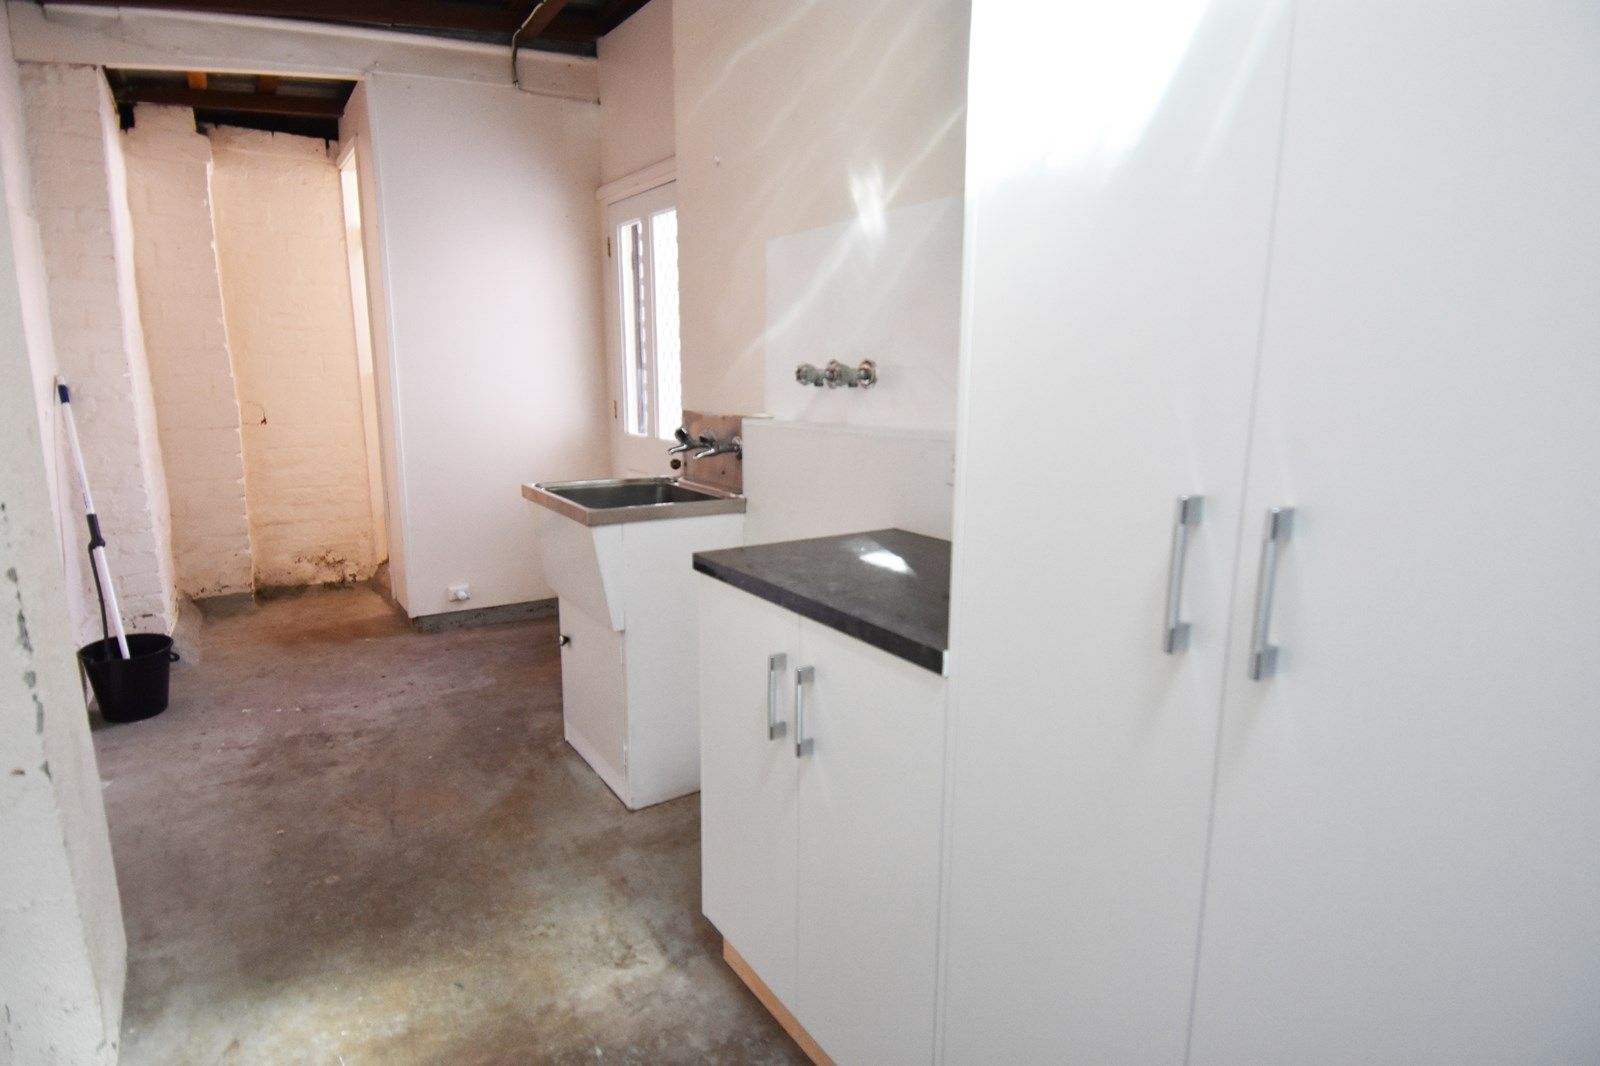 105 Raglan Street South, Ballarat Central VIC 3350, Image 5